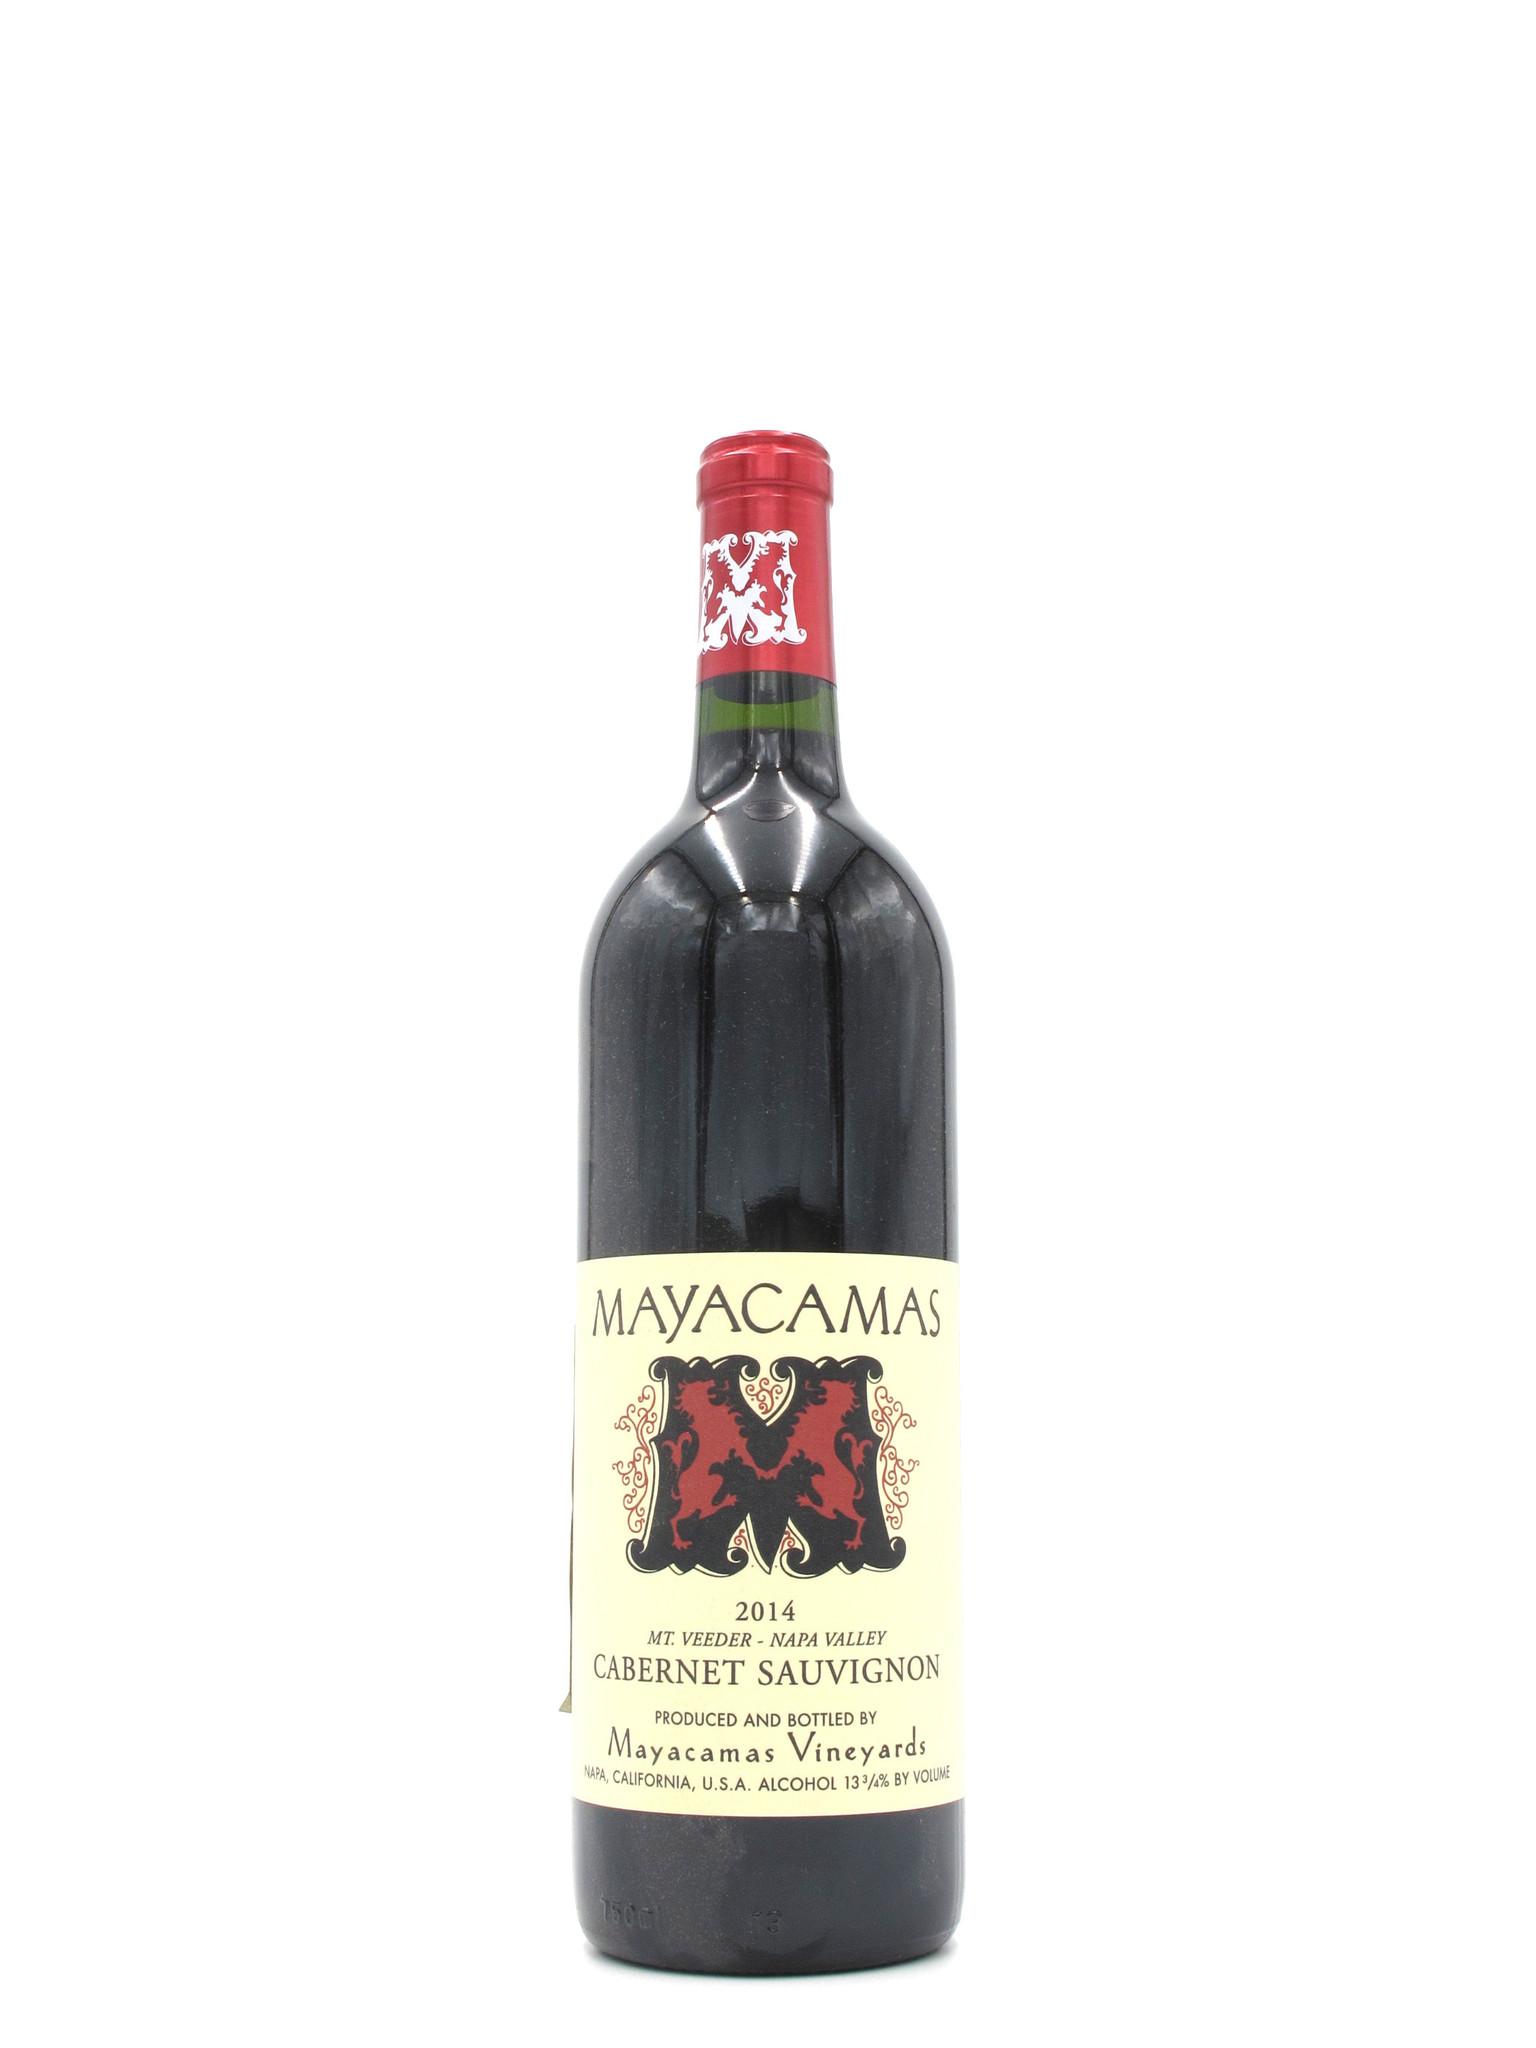 Mayacamas 2014 Mayacamas Vineyards Mt. Veeder Napa Valley Cabernet Sauvignon 750ml